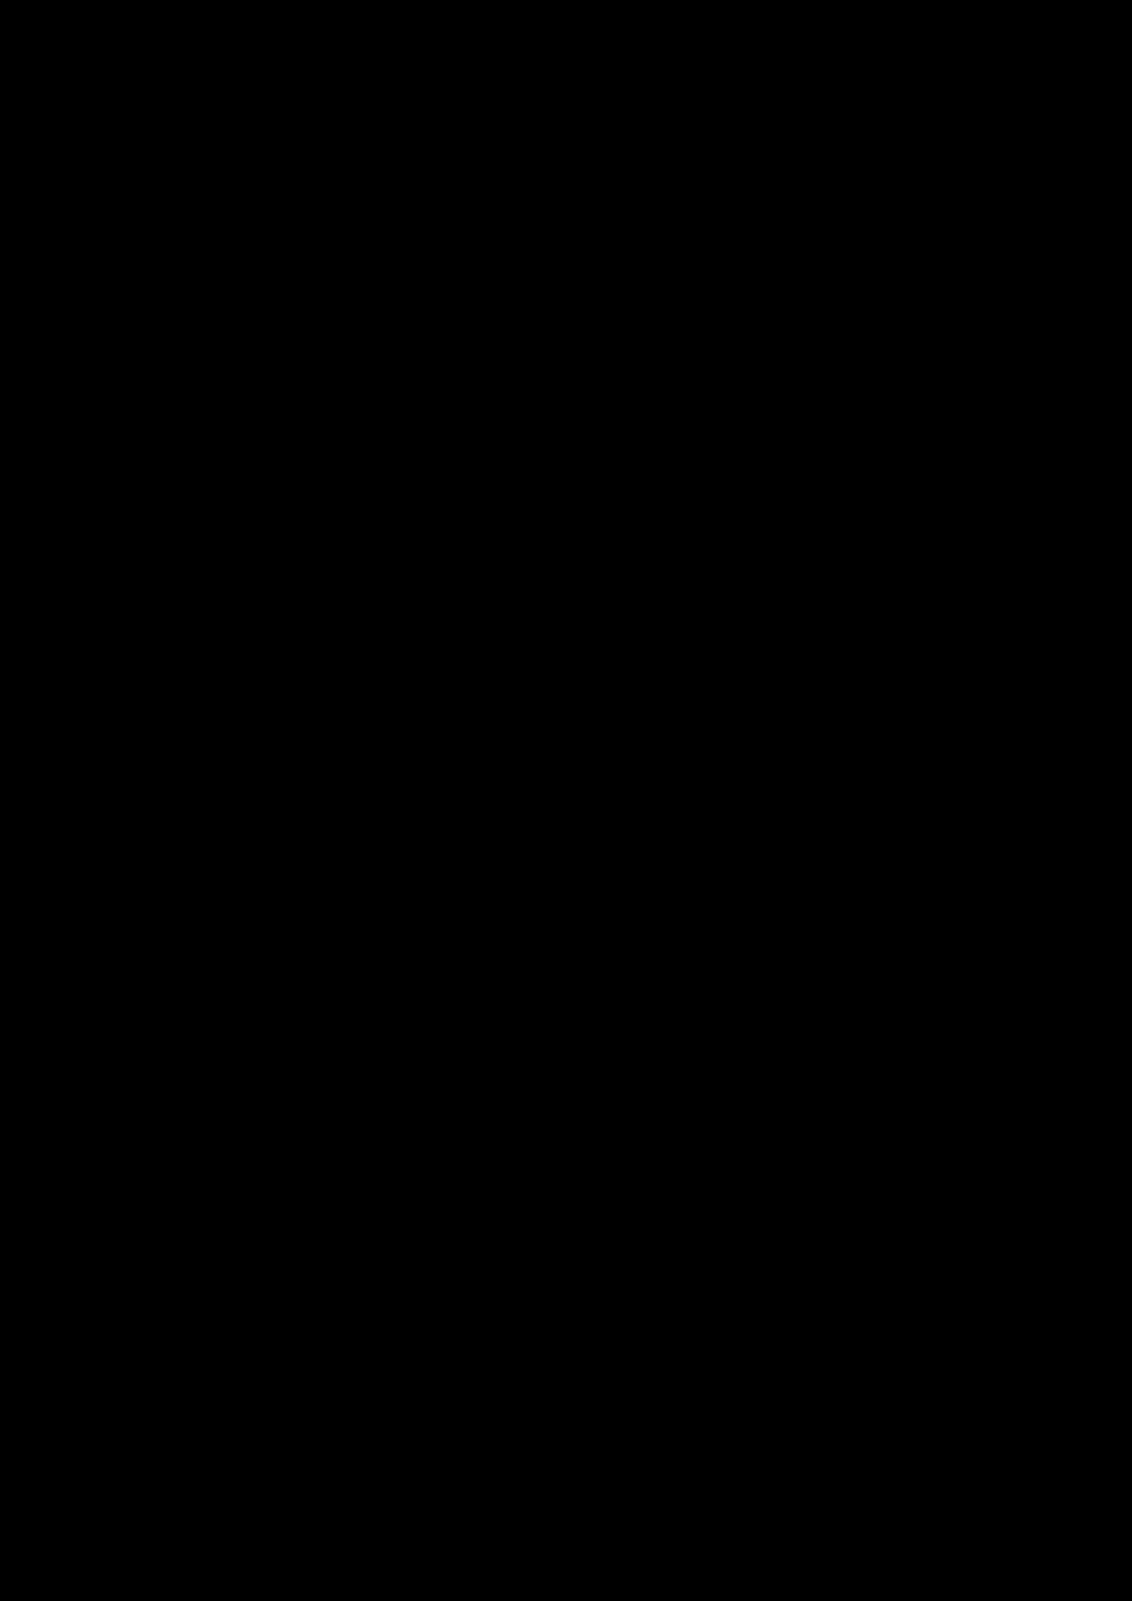 Belyiy sokol slide, Image 121